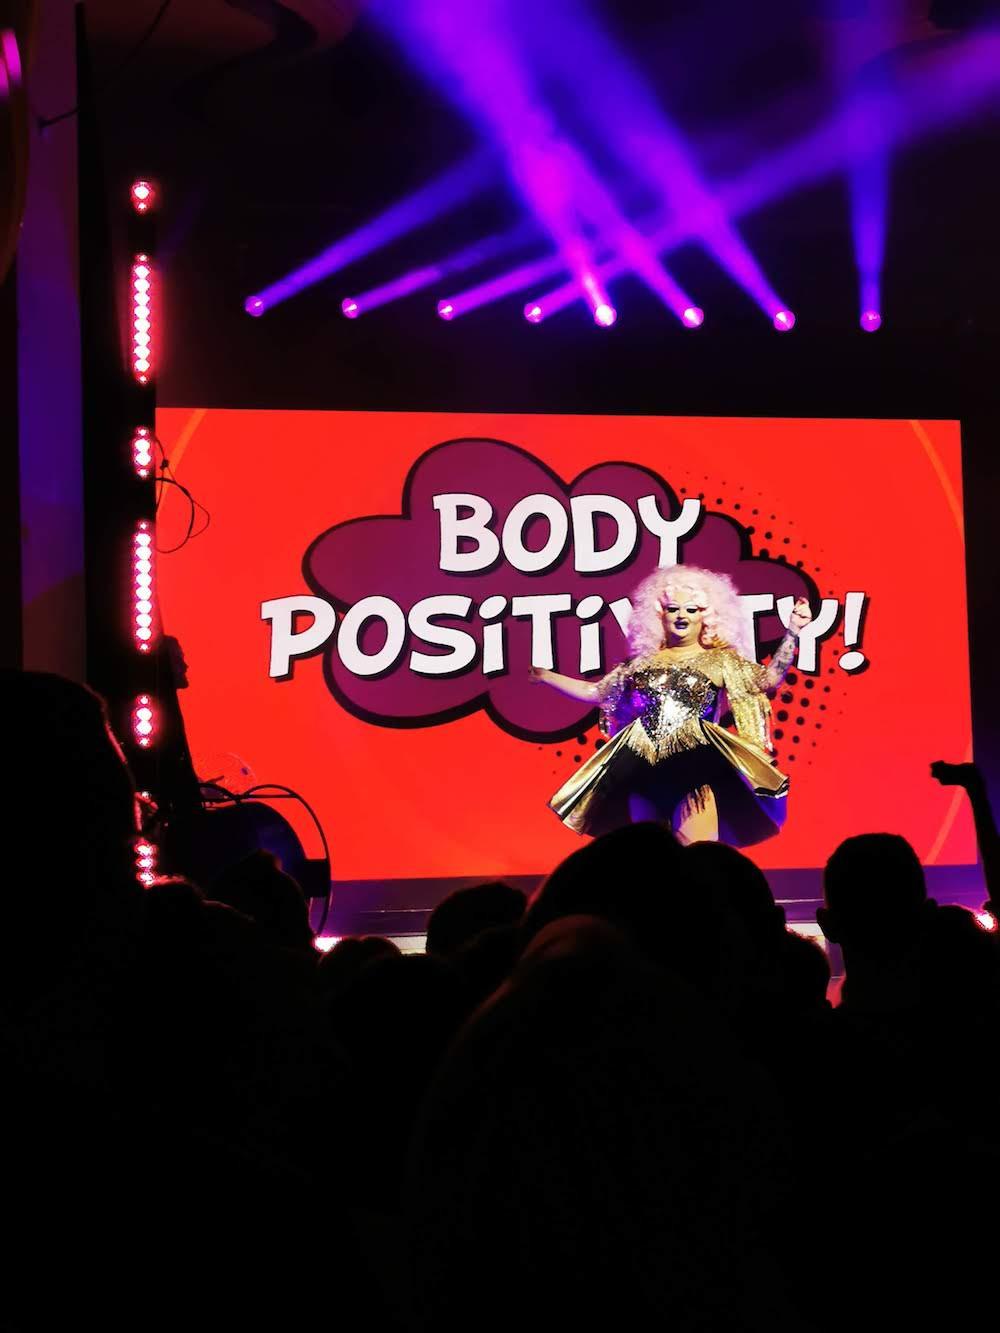 Body Positivity: Samantha Gold soll den Fans Selbstliebe vermitteln